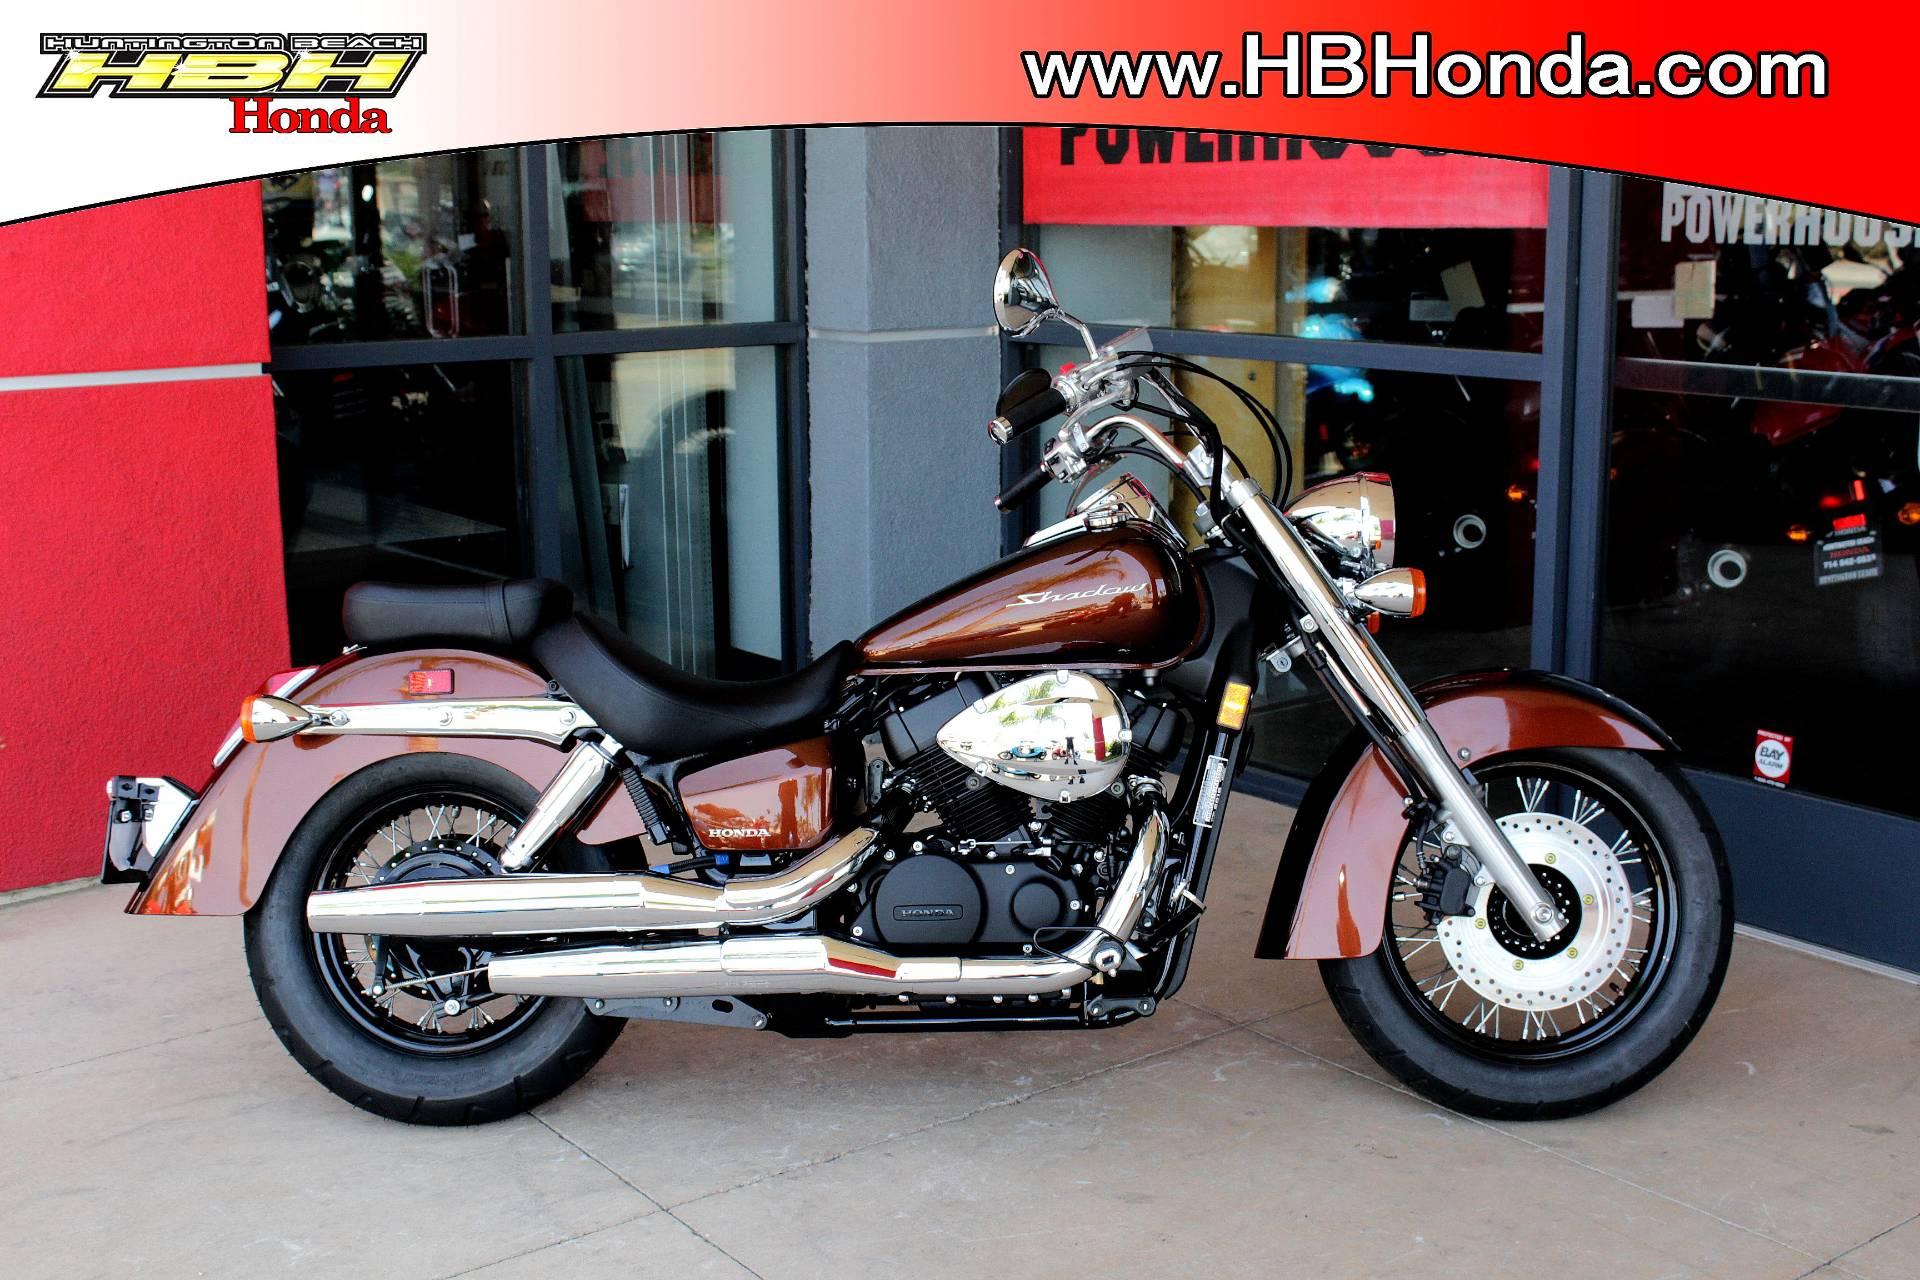 New 2020 Honda Shadow Aero 750 For Sale Specs Photos Price Huntington Beach Ca Pearl Stallion Brown M3388 0027